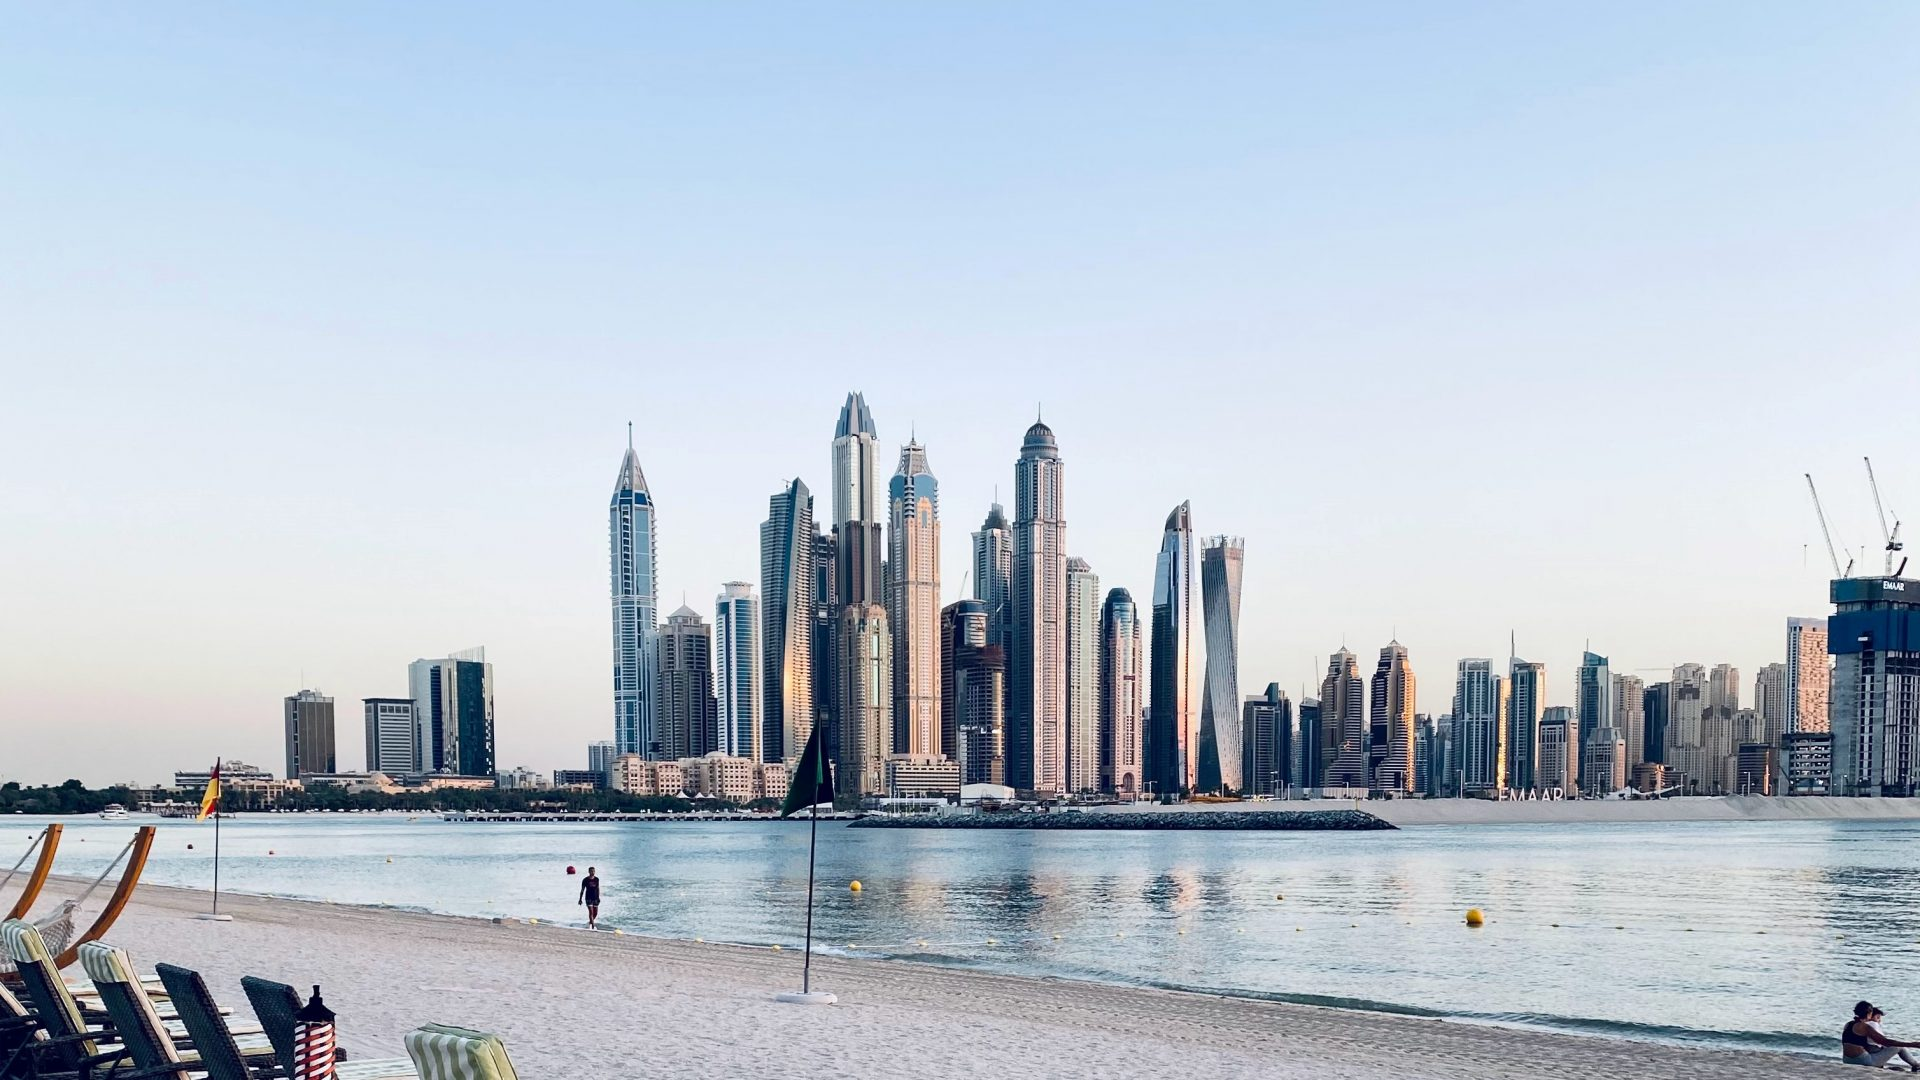 Das-St-Regis-Dubai-The-Palm-er-ffnet-im-Mai-in-Dubai